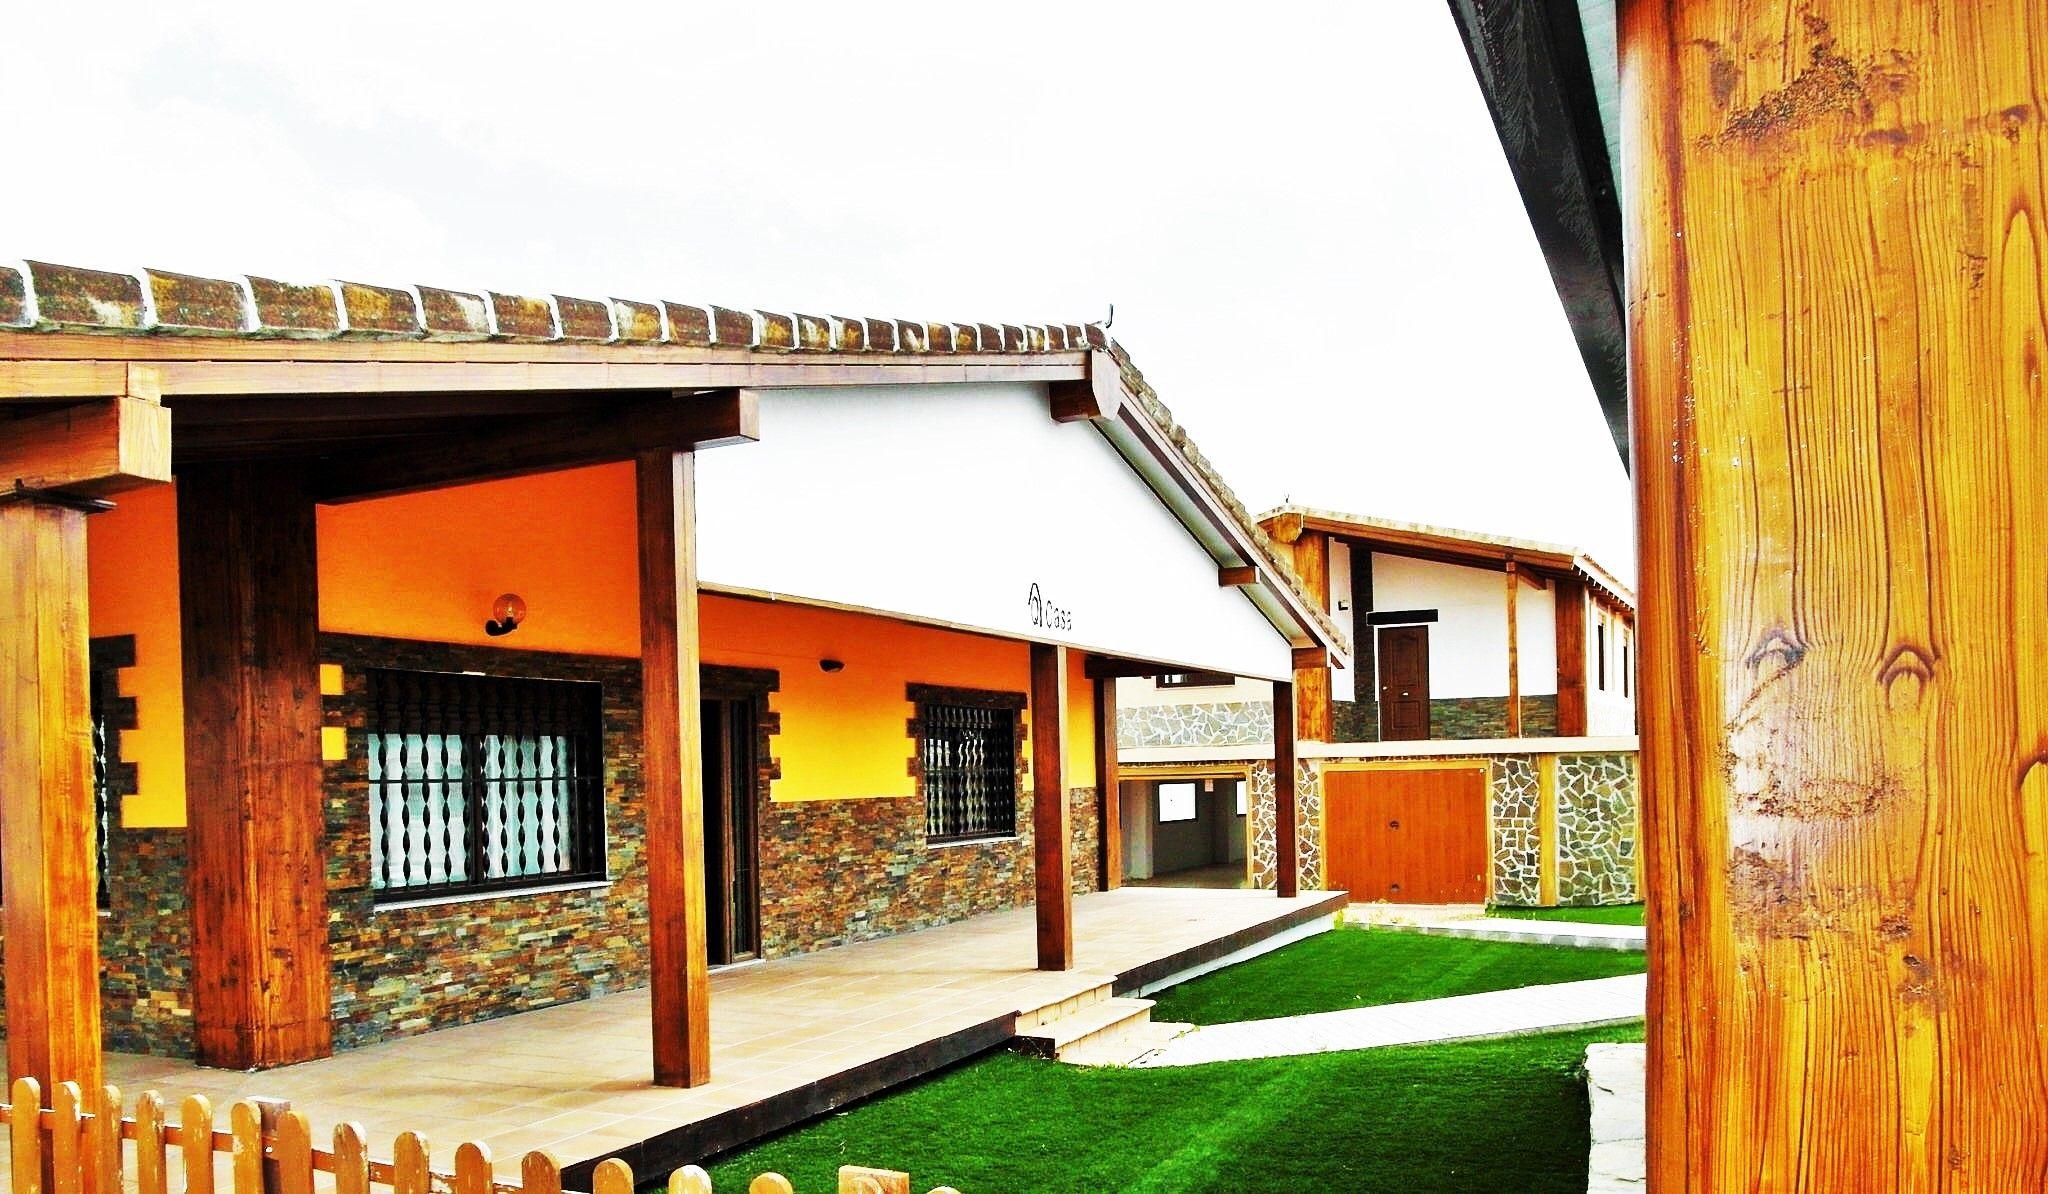 Exposicion de viviendas prefabricadas de hormigon casas de acero y - Acero casas prefabricadas ...